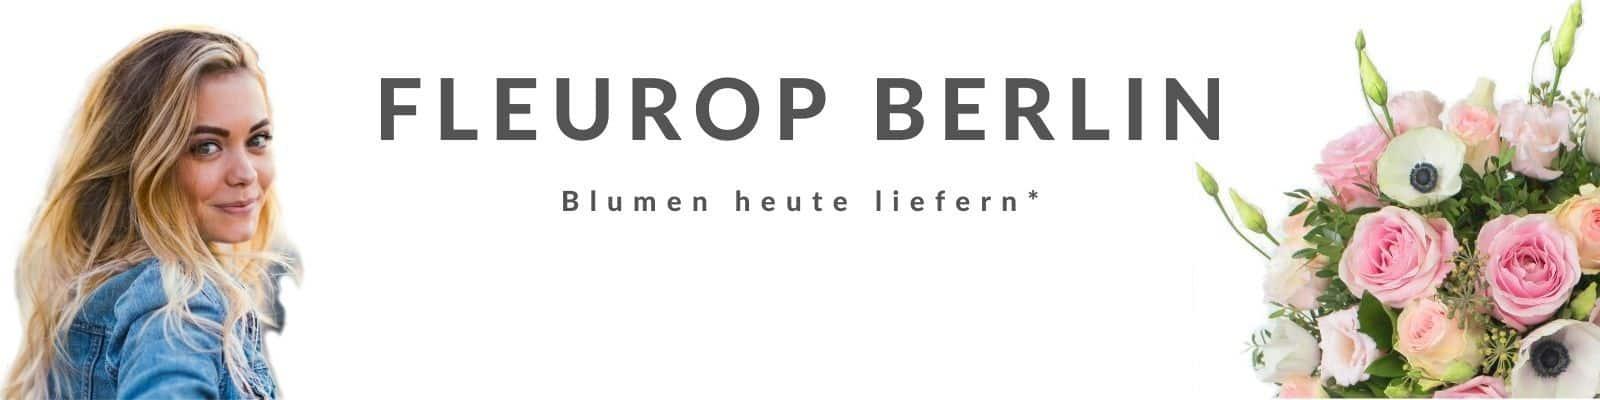 Fleurop Berlin